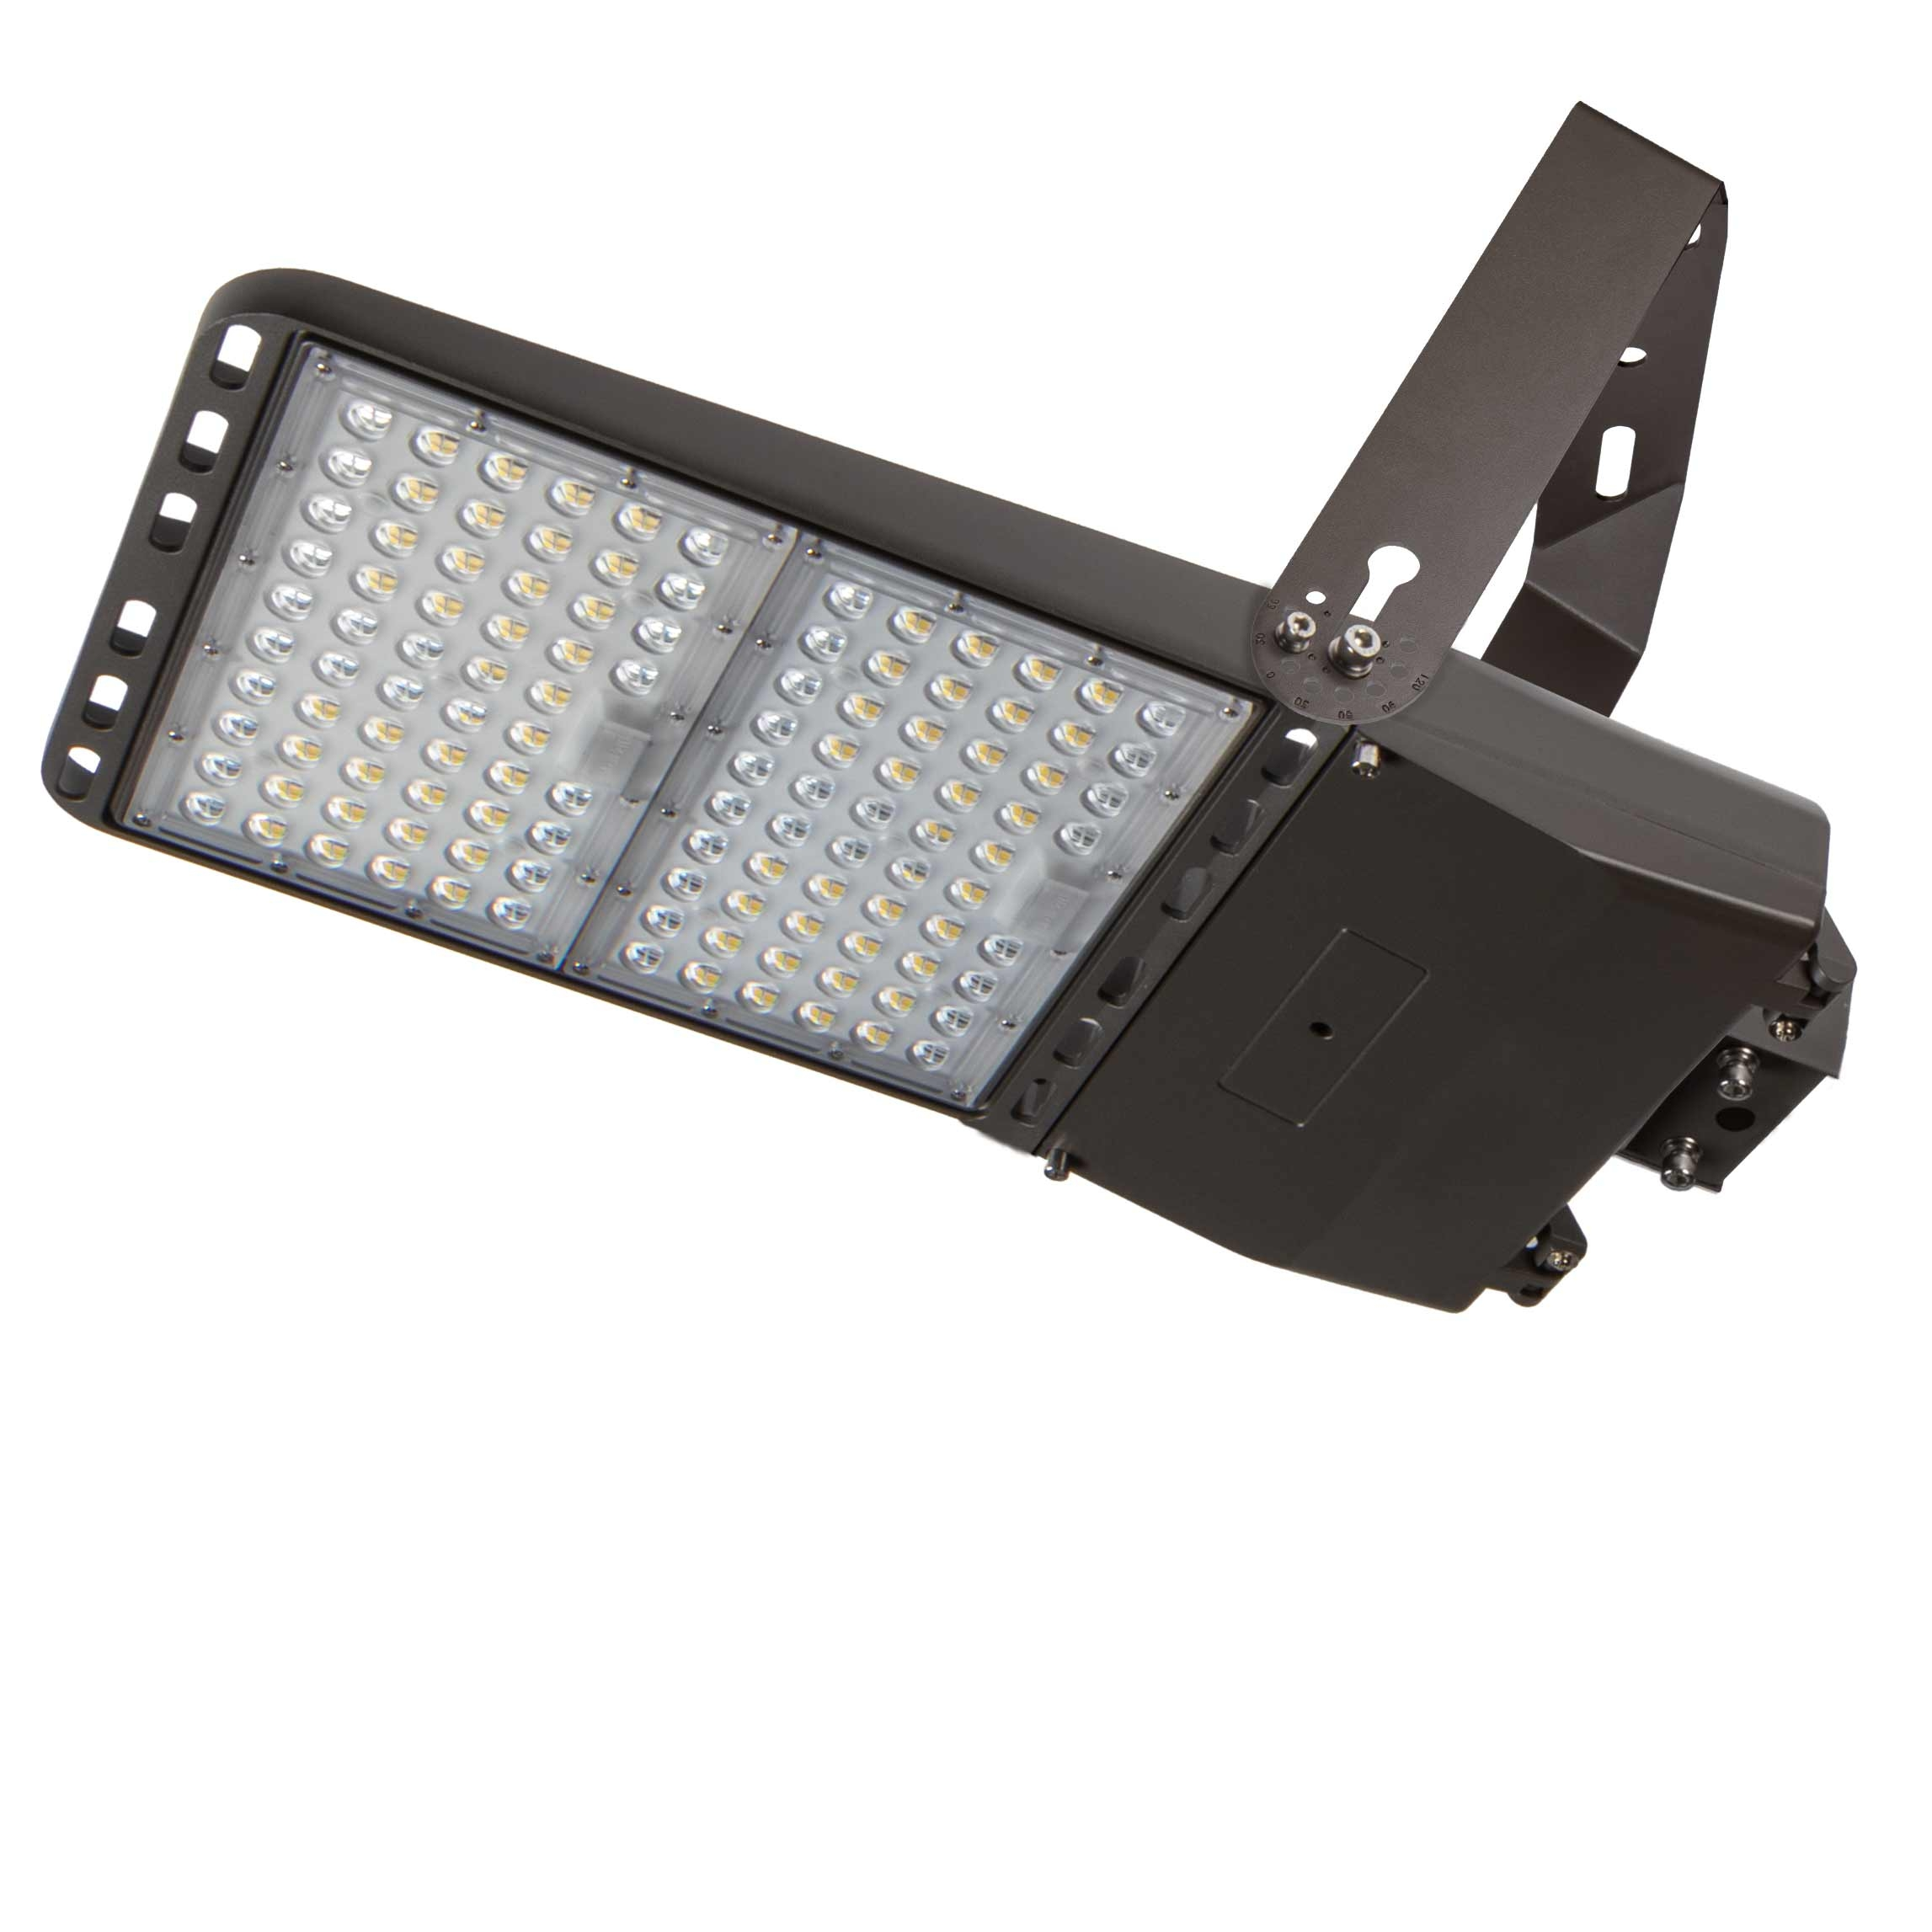 1000 Watt Metal Halide Led Replacement 300w led flood light/area light - 1000w metal halide equivalent - 42000  lumens